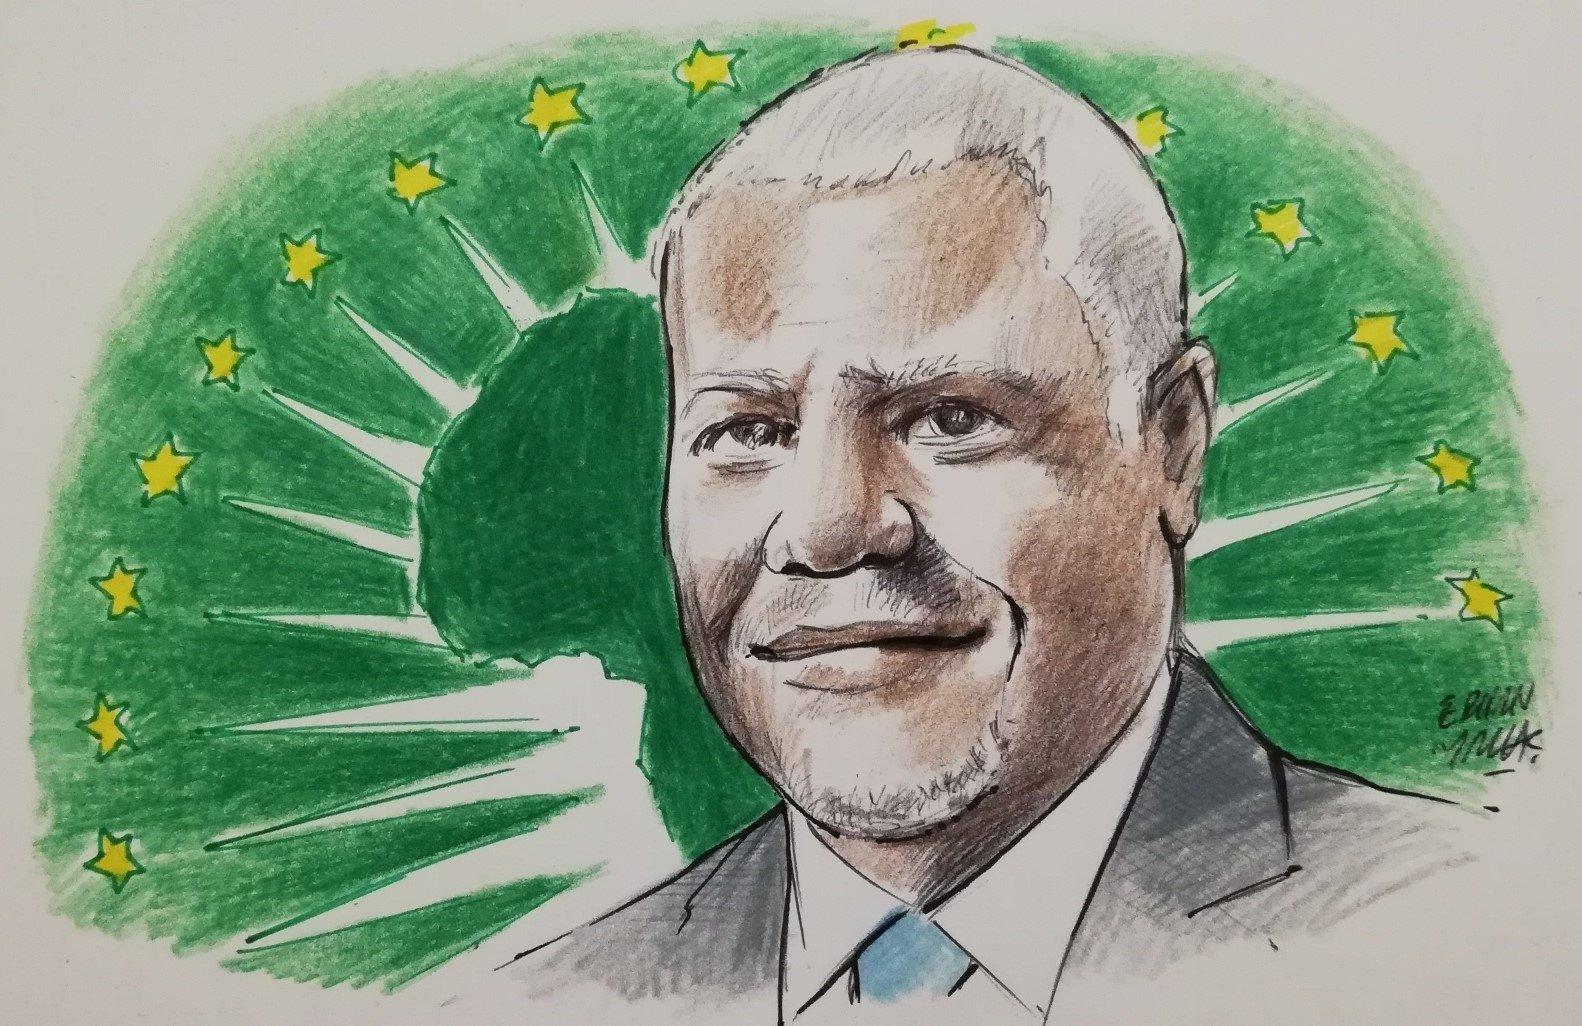 An Illustration featuring Moussa Faki Mahamat by Erhan Yalvaç.